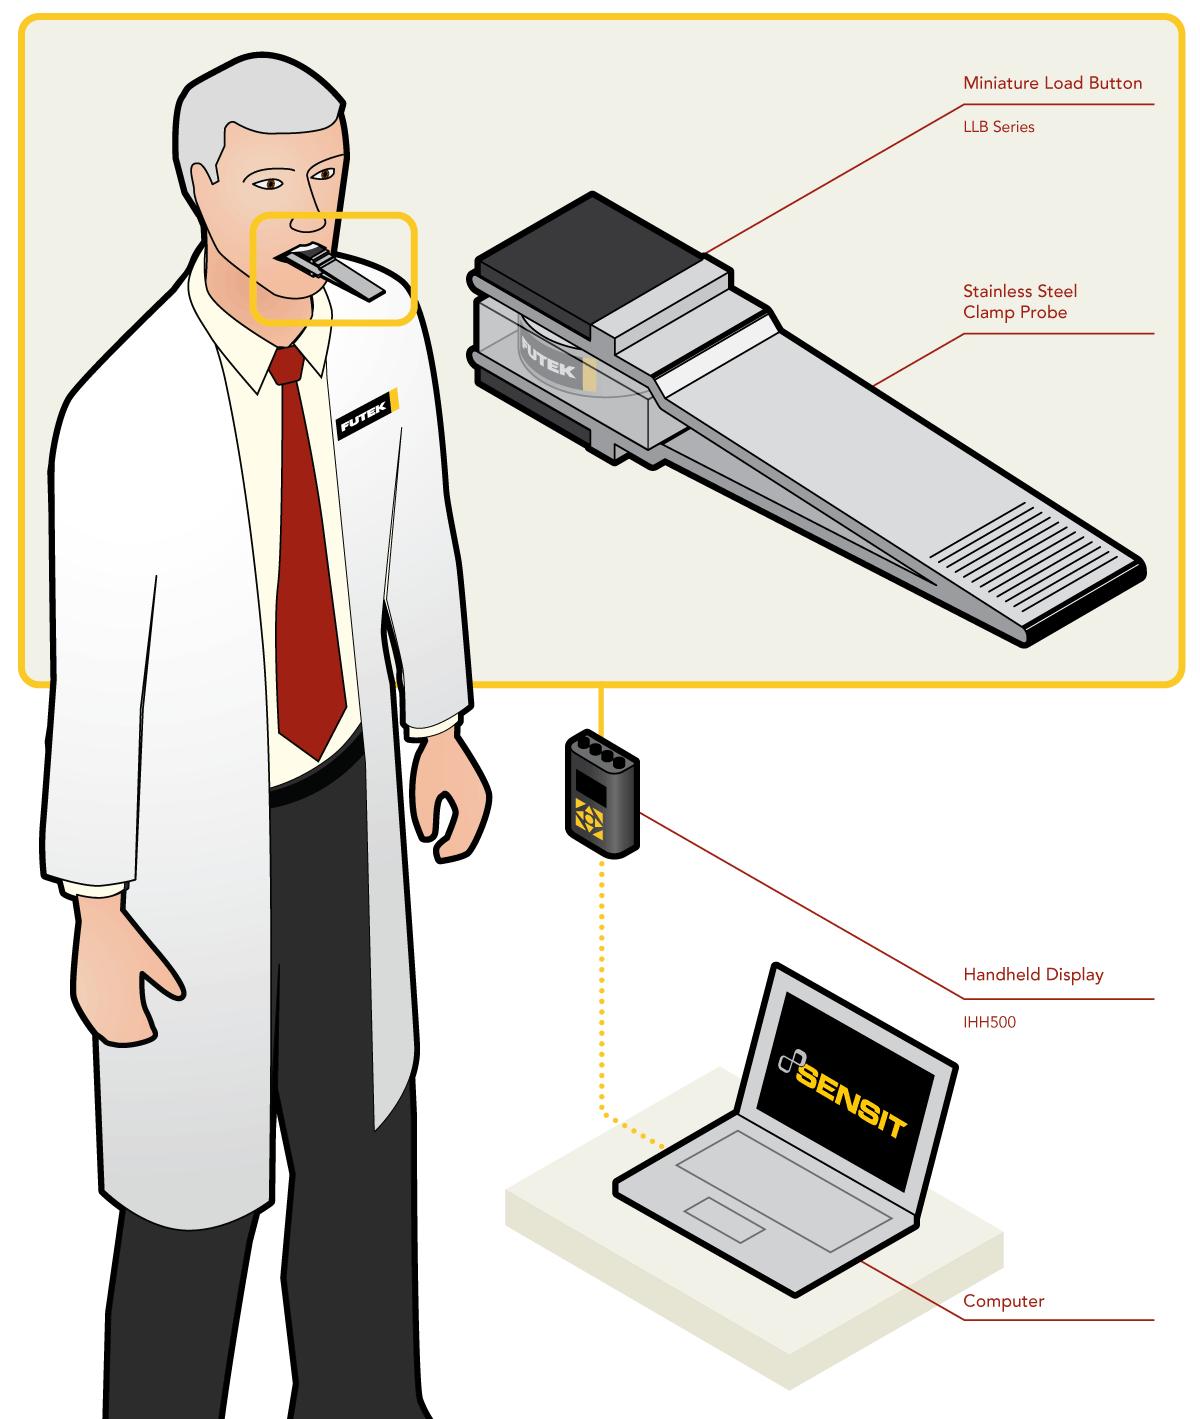 Bite Force Measurement Study